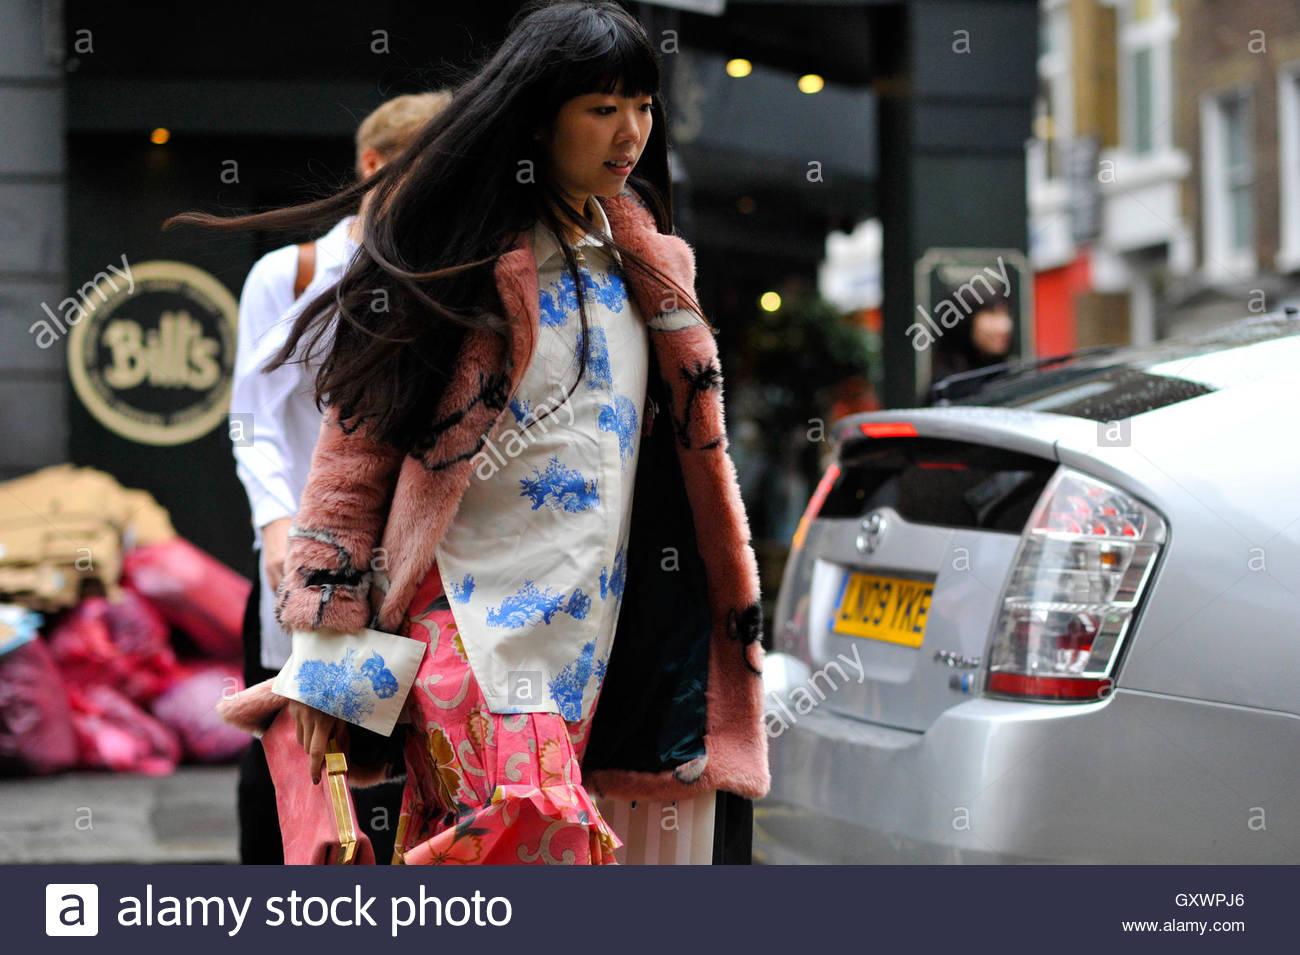 Blogger Style-Bubble periodista Susie Lau sobre Brewer street durante la Semana de la Moda de Londres SS17 FW16 Imagen De Stock